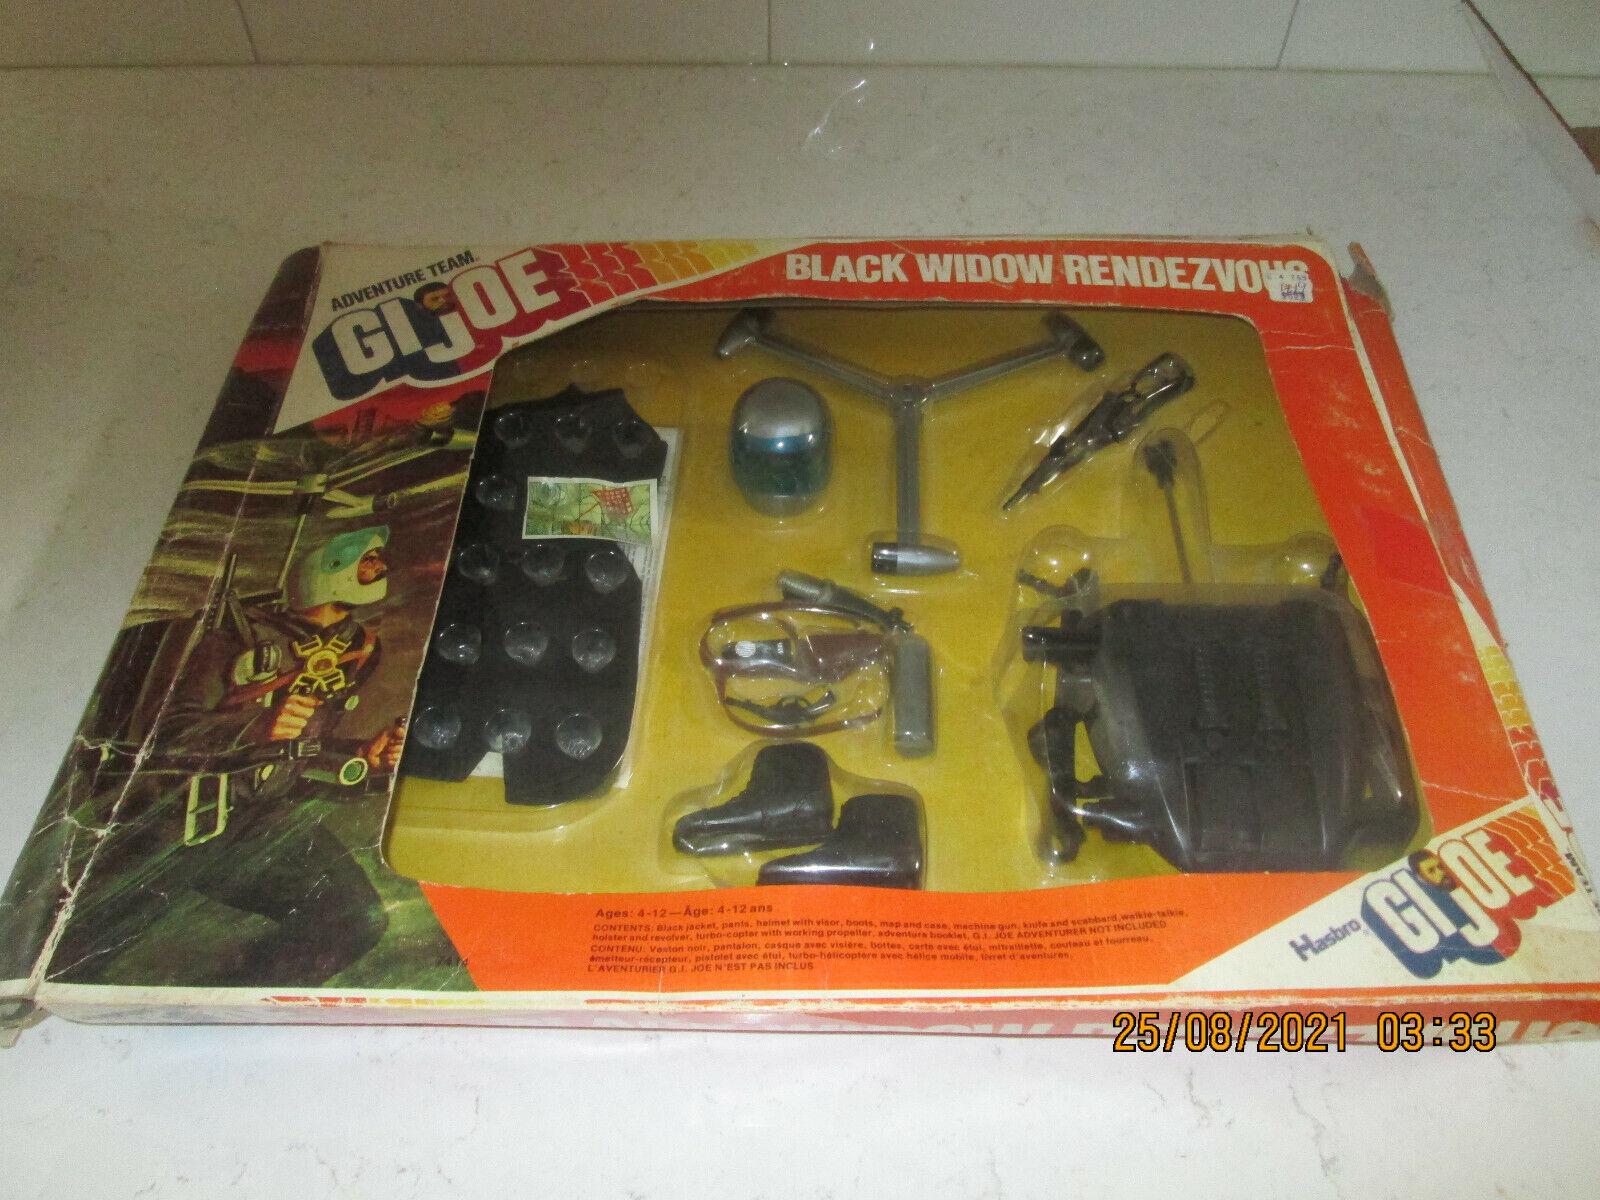 GI Joe Black Widow Rendezvous set- 5 Awesome Things on eBay